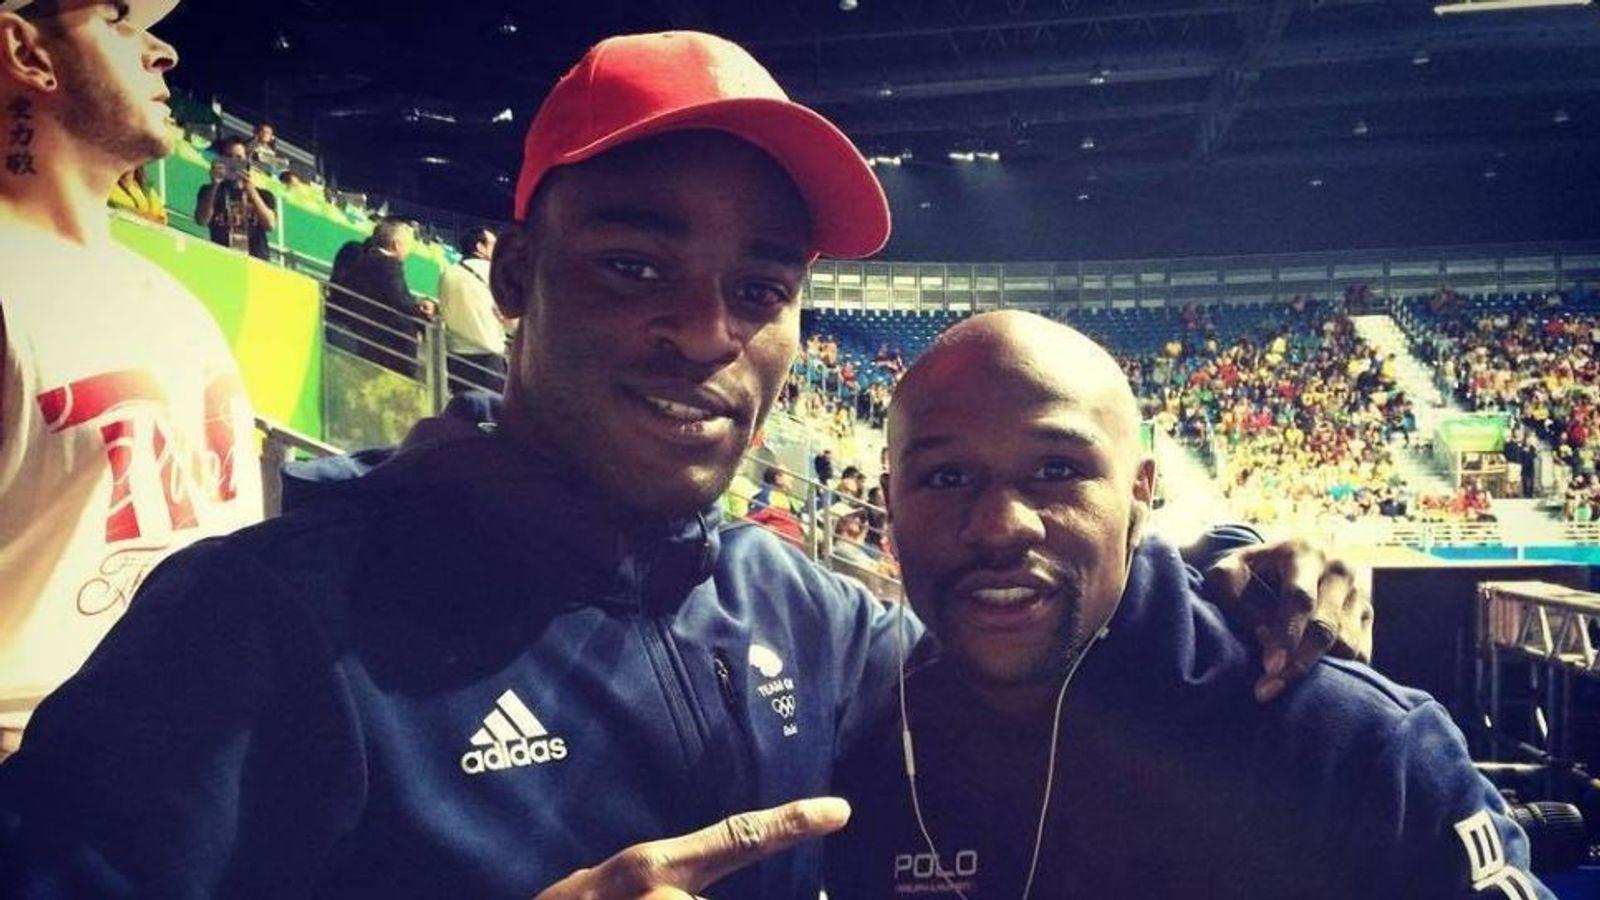 apertura Miedo a morir Máquina de escribir  Olympic Boxing: Joshua Buatsi encouraged by Floyd Mayweather | Boxing News  | Sky Sports